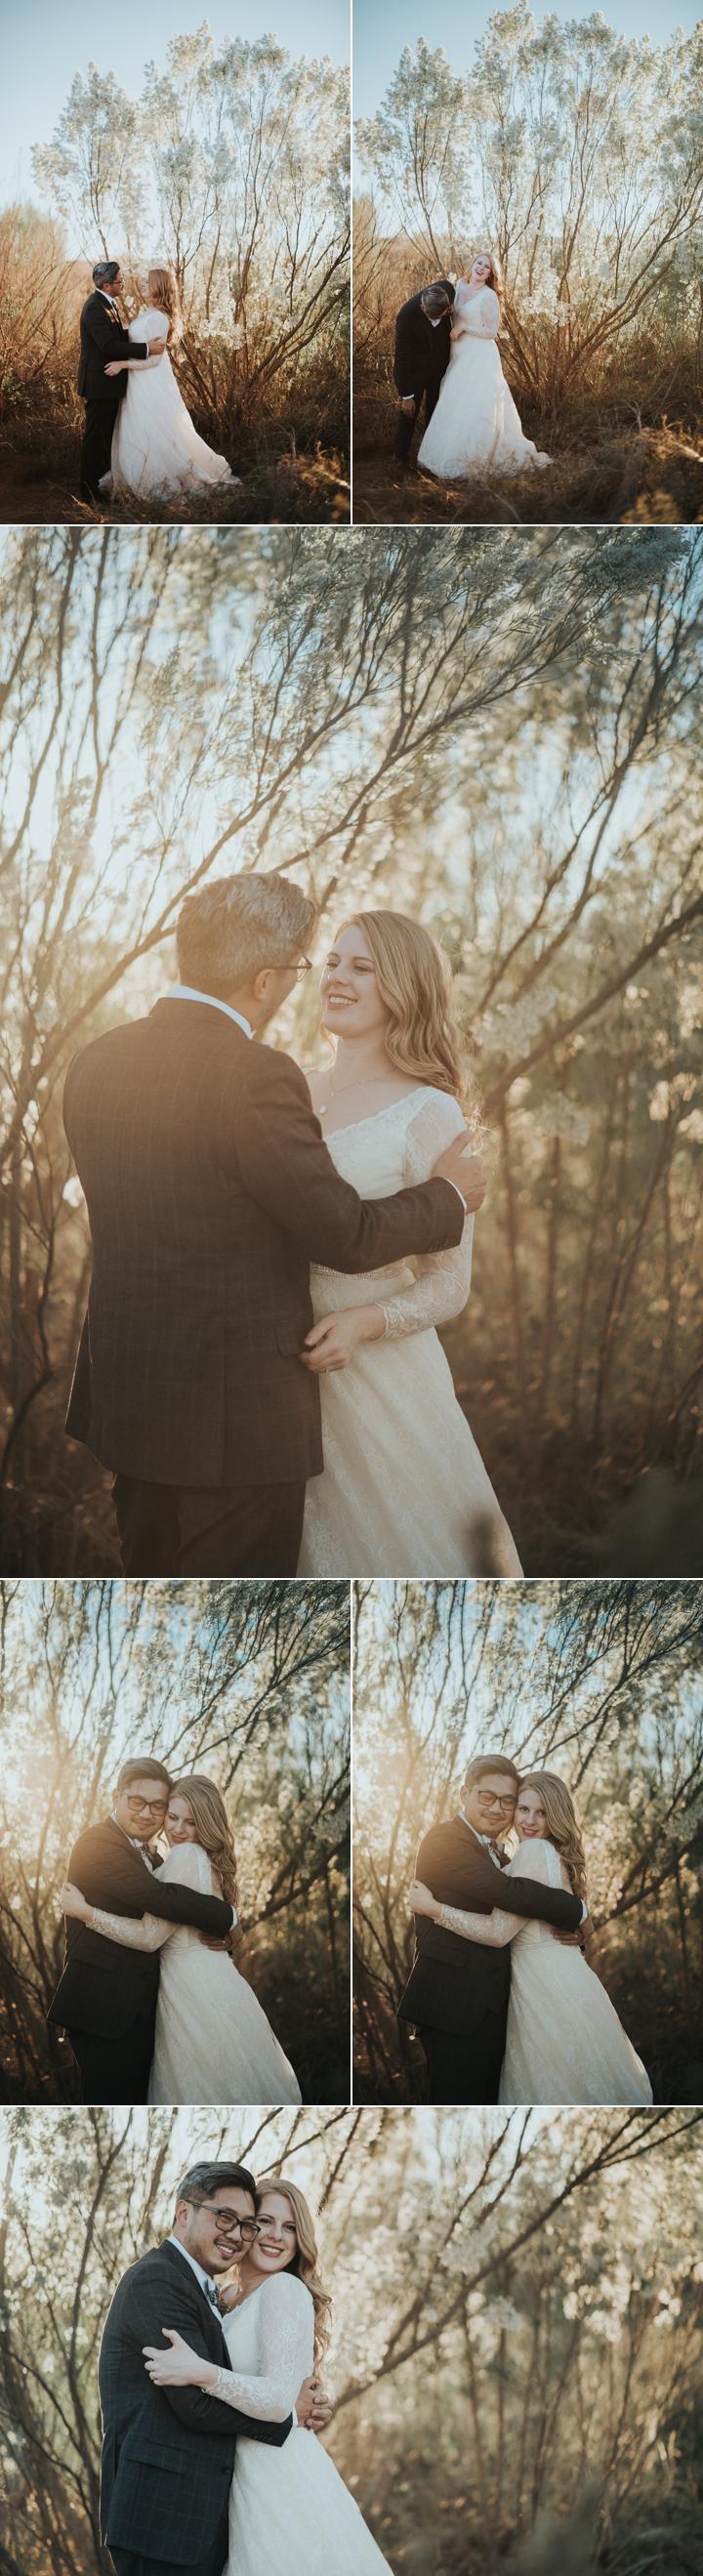 dallas-wedding-photographers-vb 20.jpg